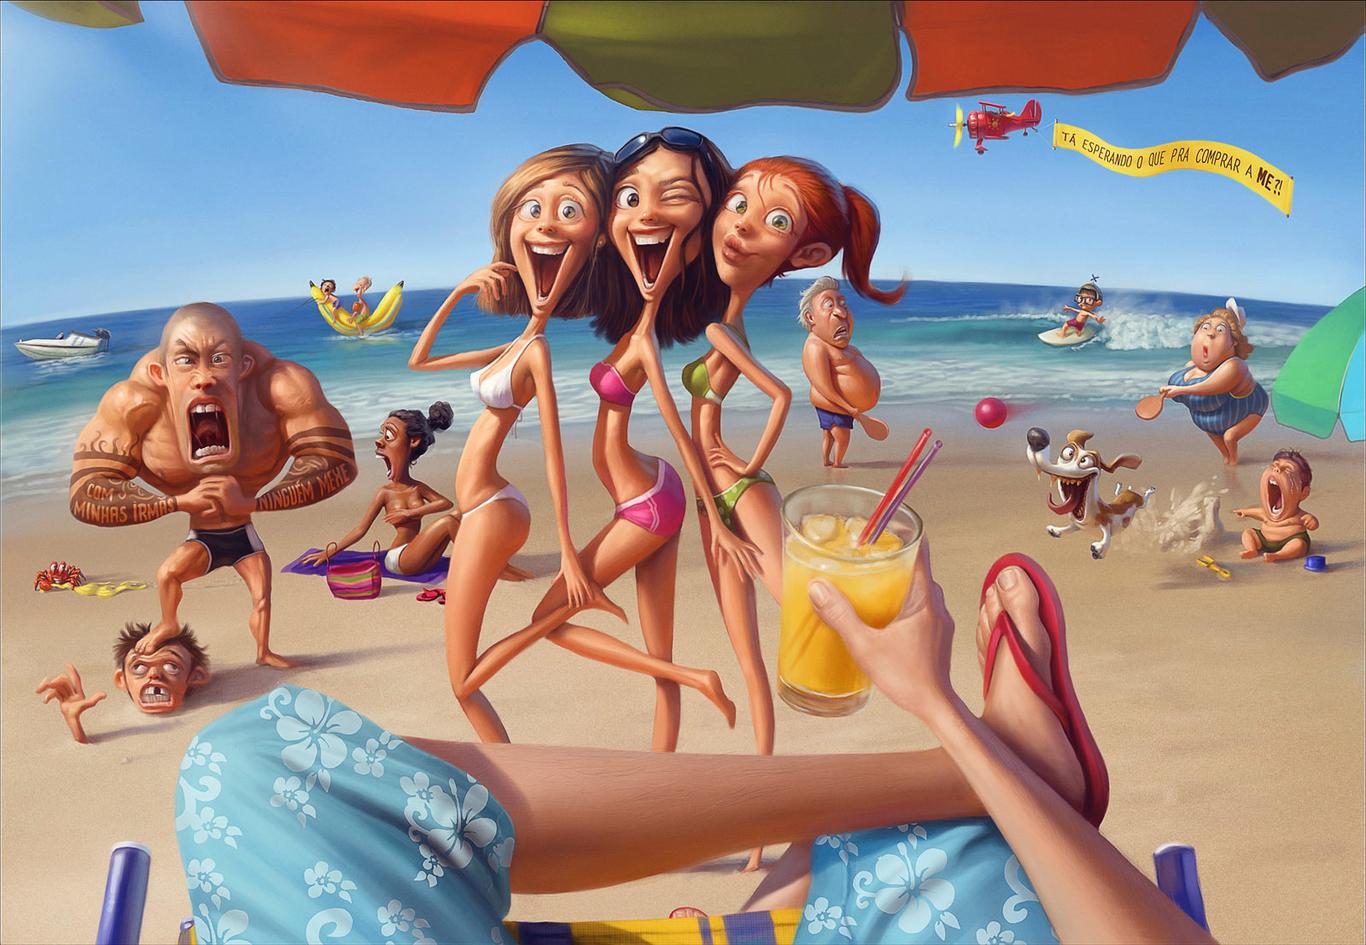 Tiagohoisel beach 1 844e11c1 u7yq